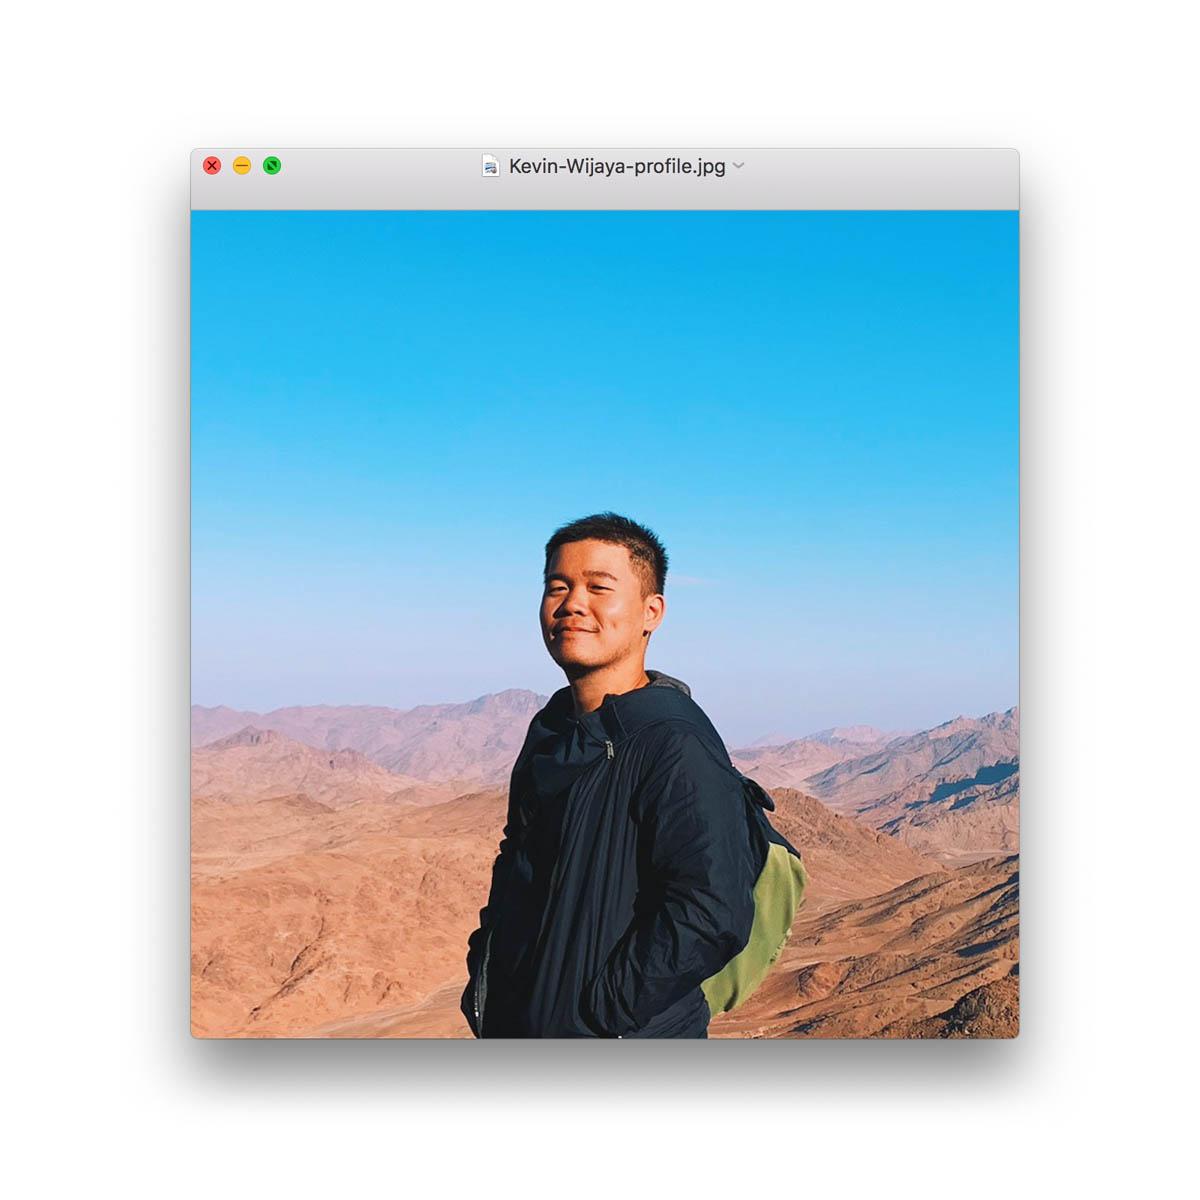 kevin-wijaya-profile-ss.jpg